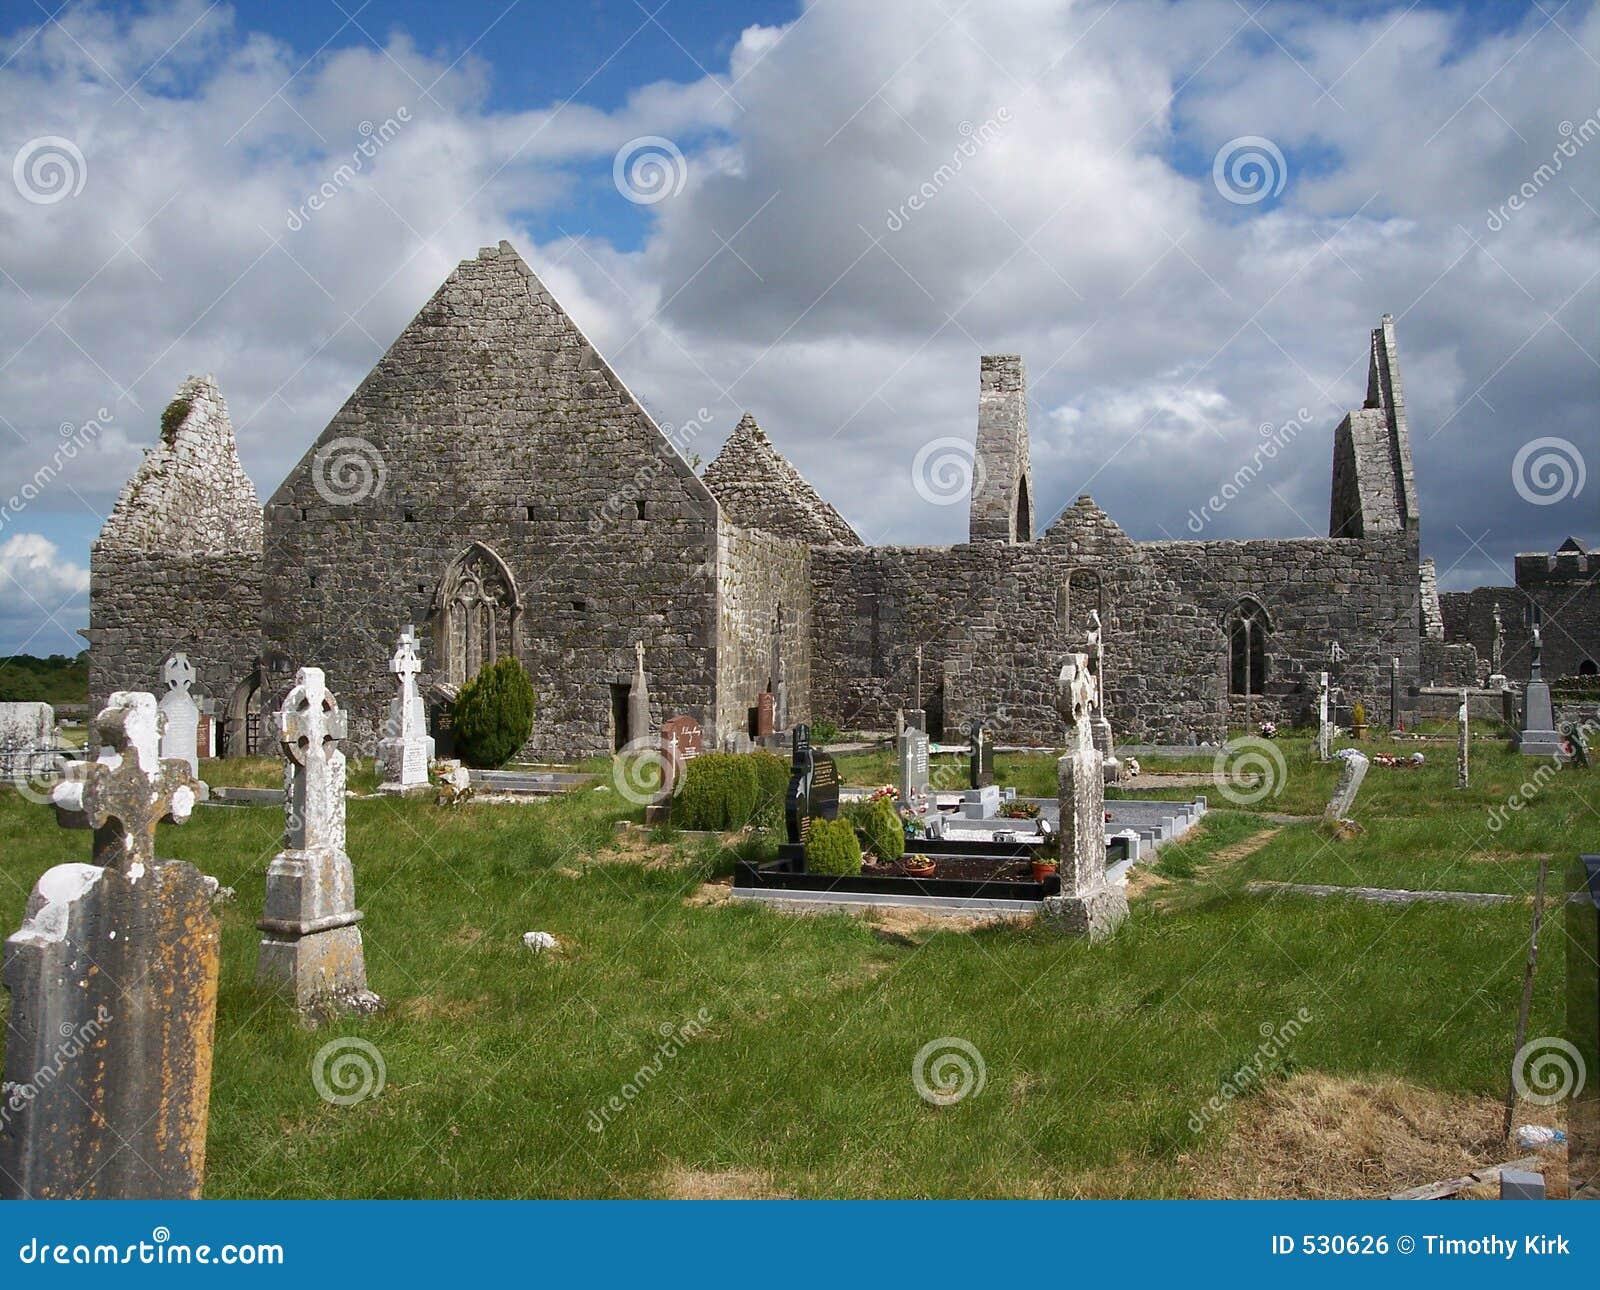 Kilmacduagh, Co. Clare, Ireland